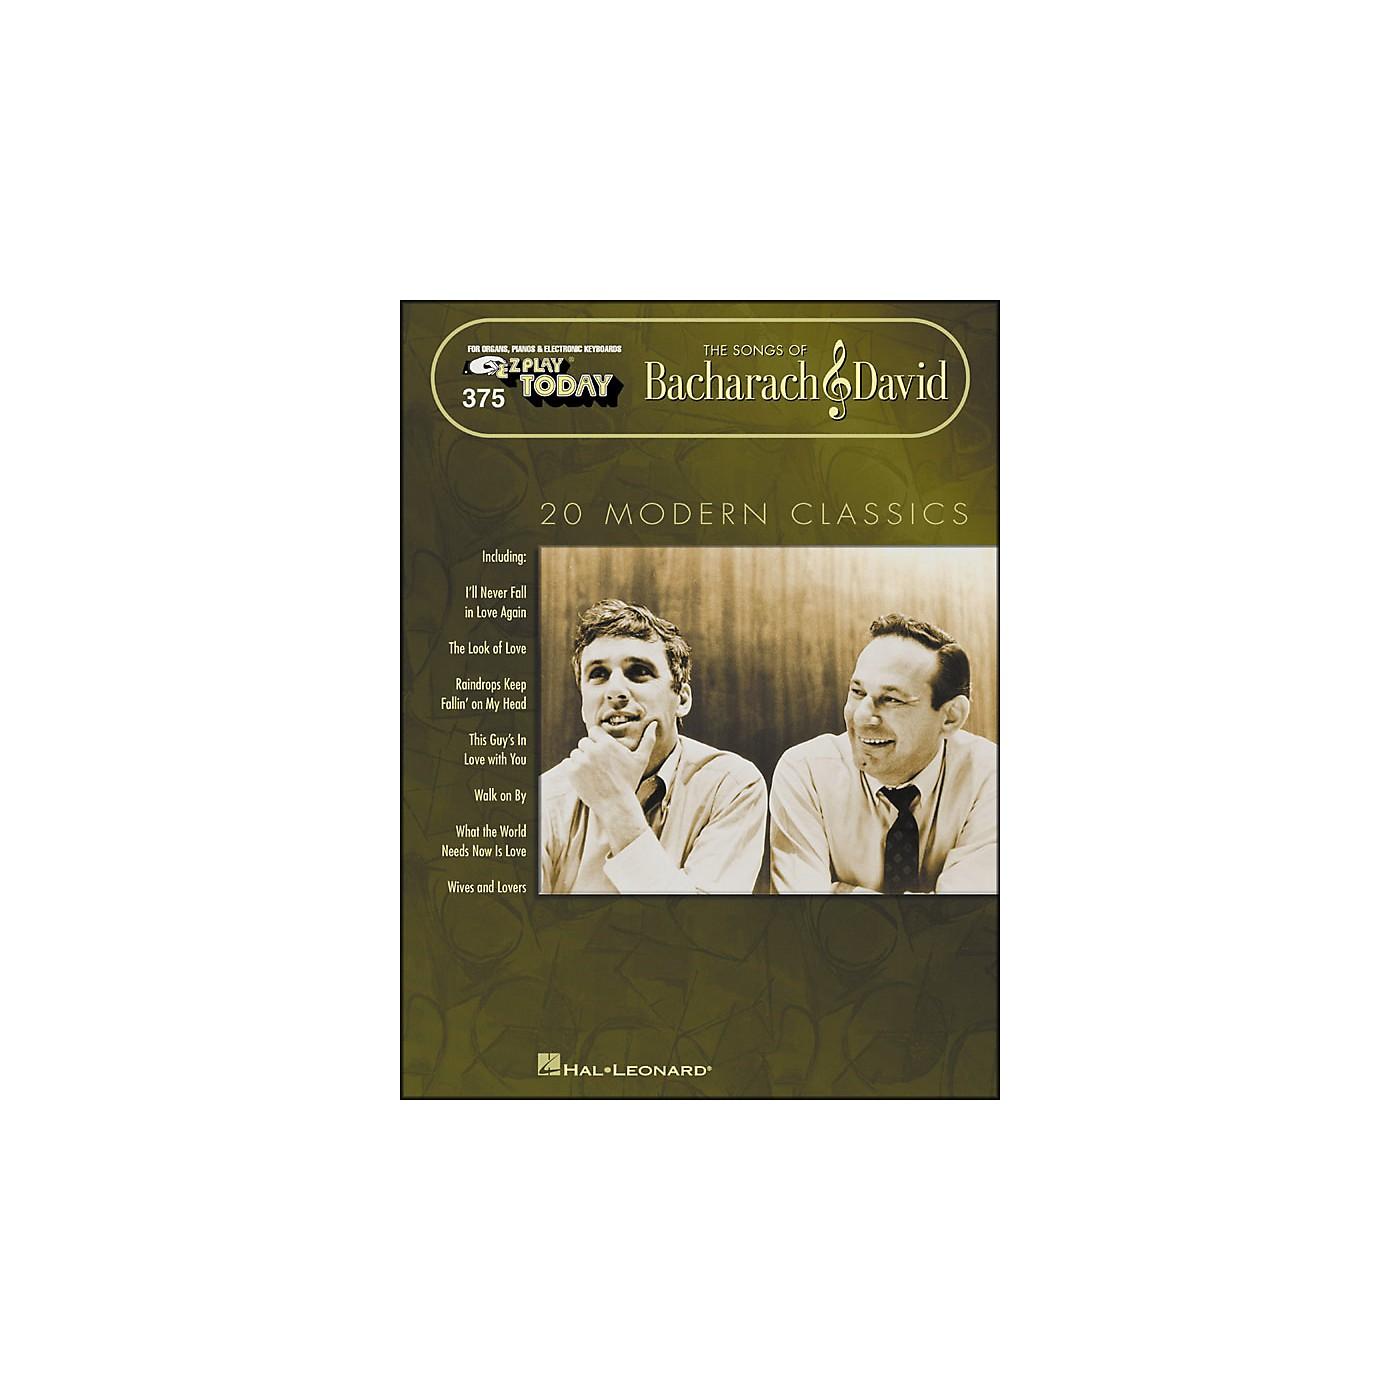 Hal Leonard Bacharach & David - The Songs Of 20 Modern Classics E-Z Play 375 thumbnail